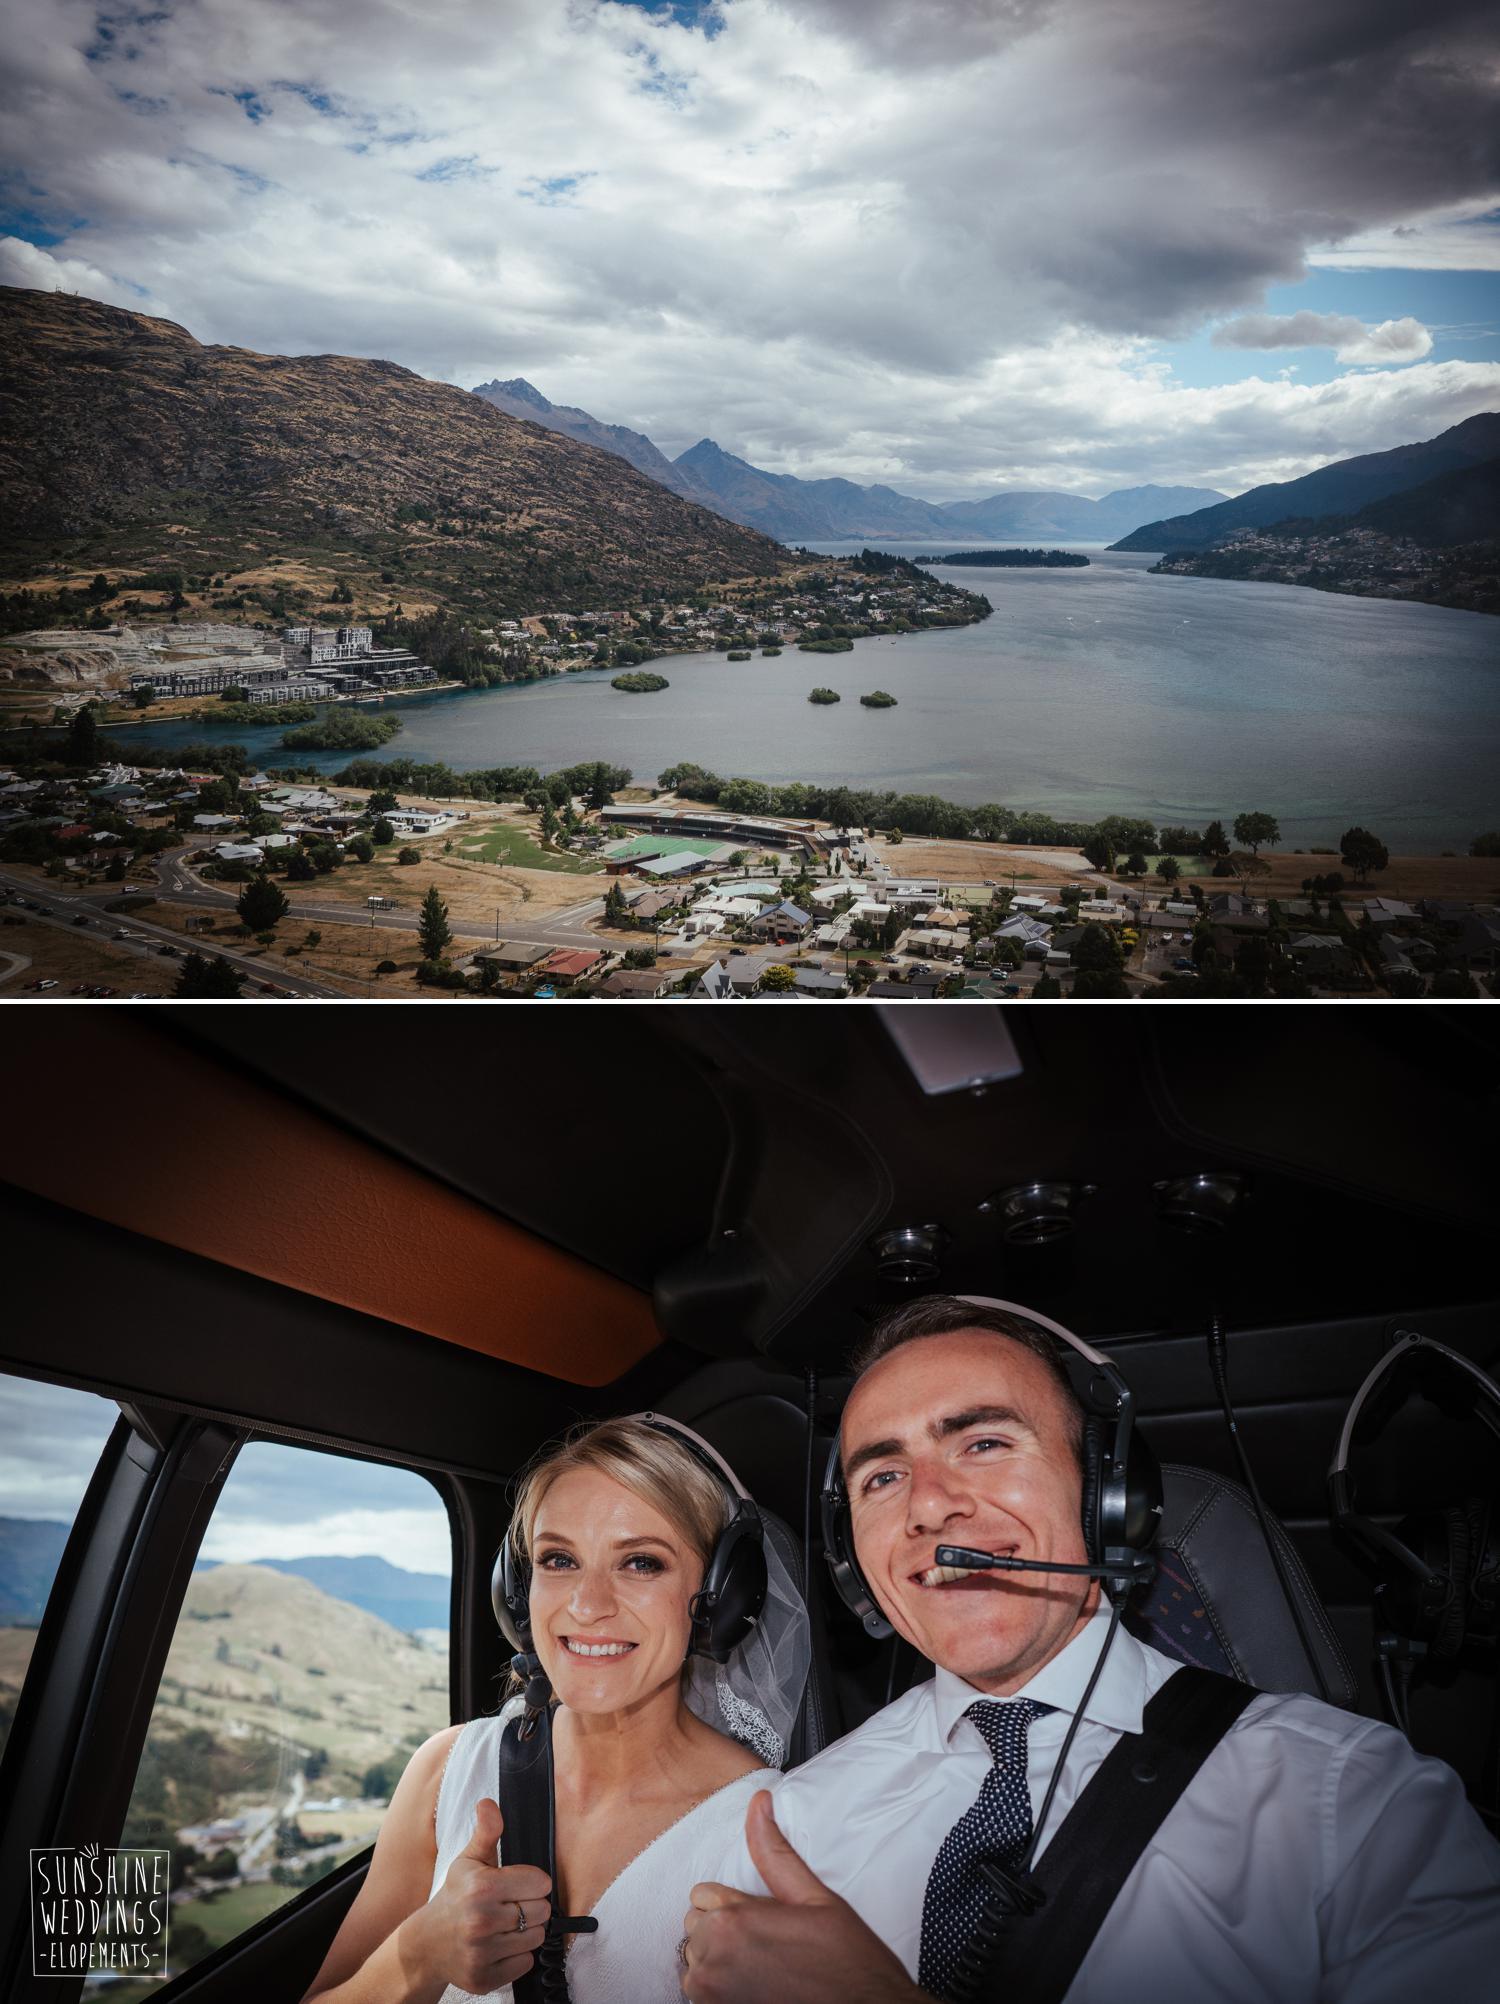 Mountain wedding helicopter